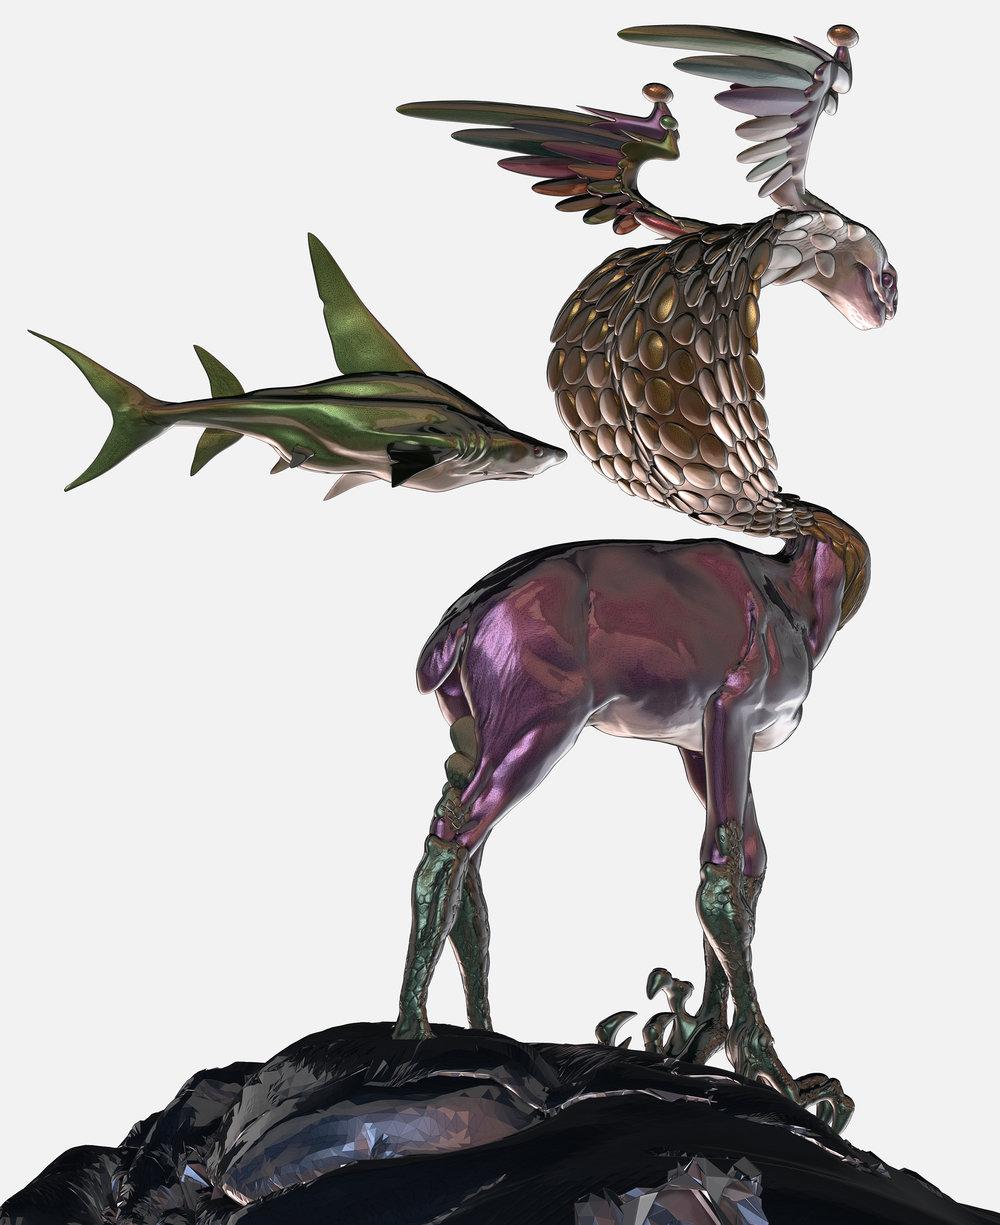 Max Brazier-Jones concept art creature beast zbrush 1